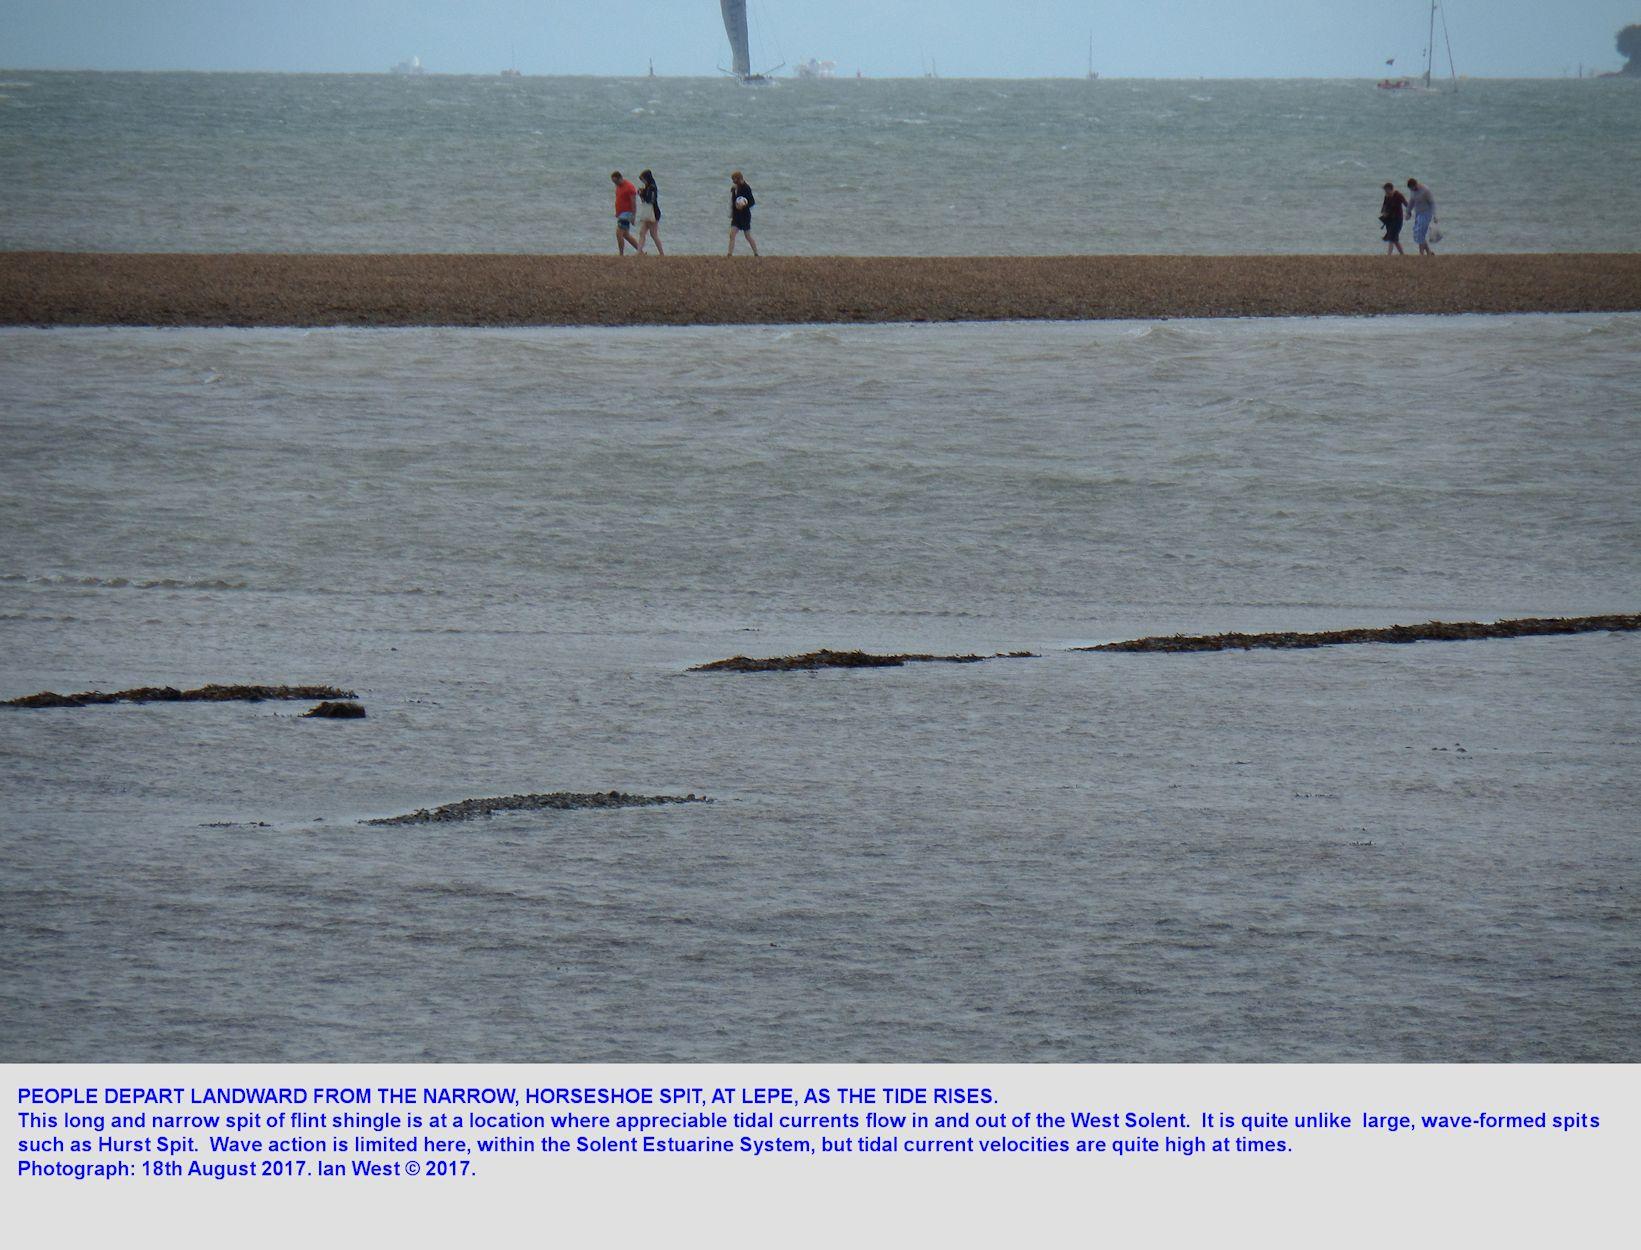 People leave Horse Spit, the transverse estuarine spit of shingle, east of Stone Point, Lepe, as the tide rises